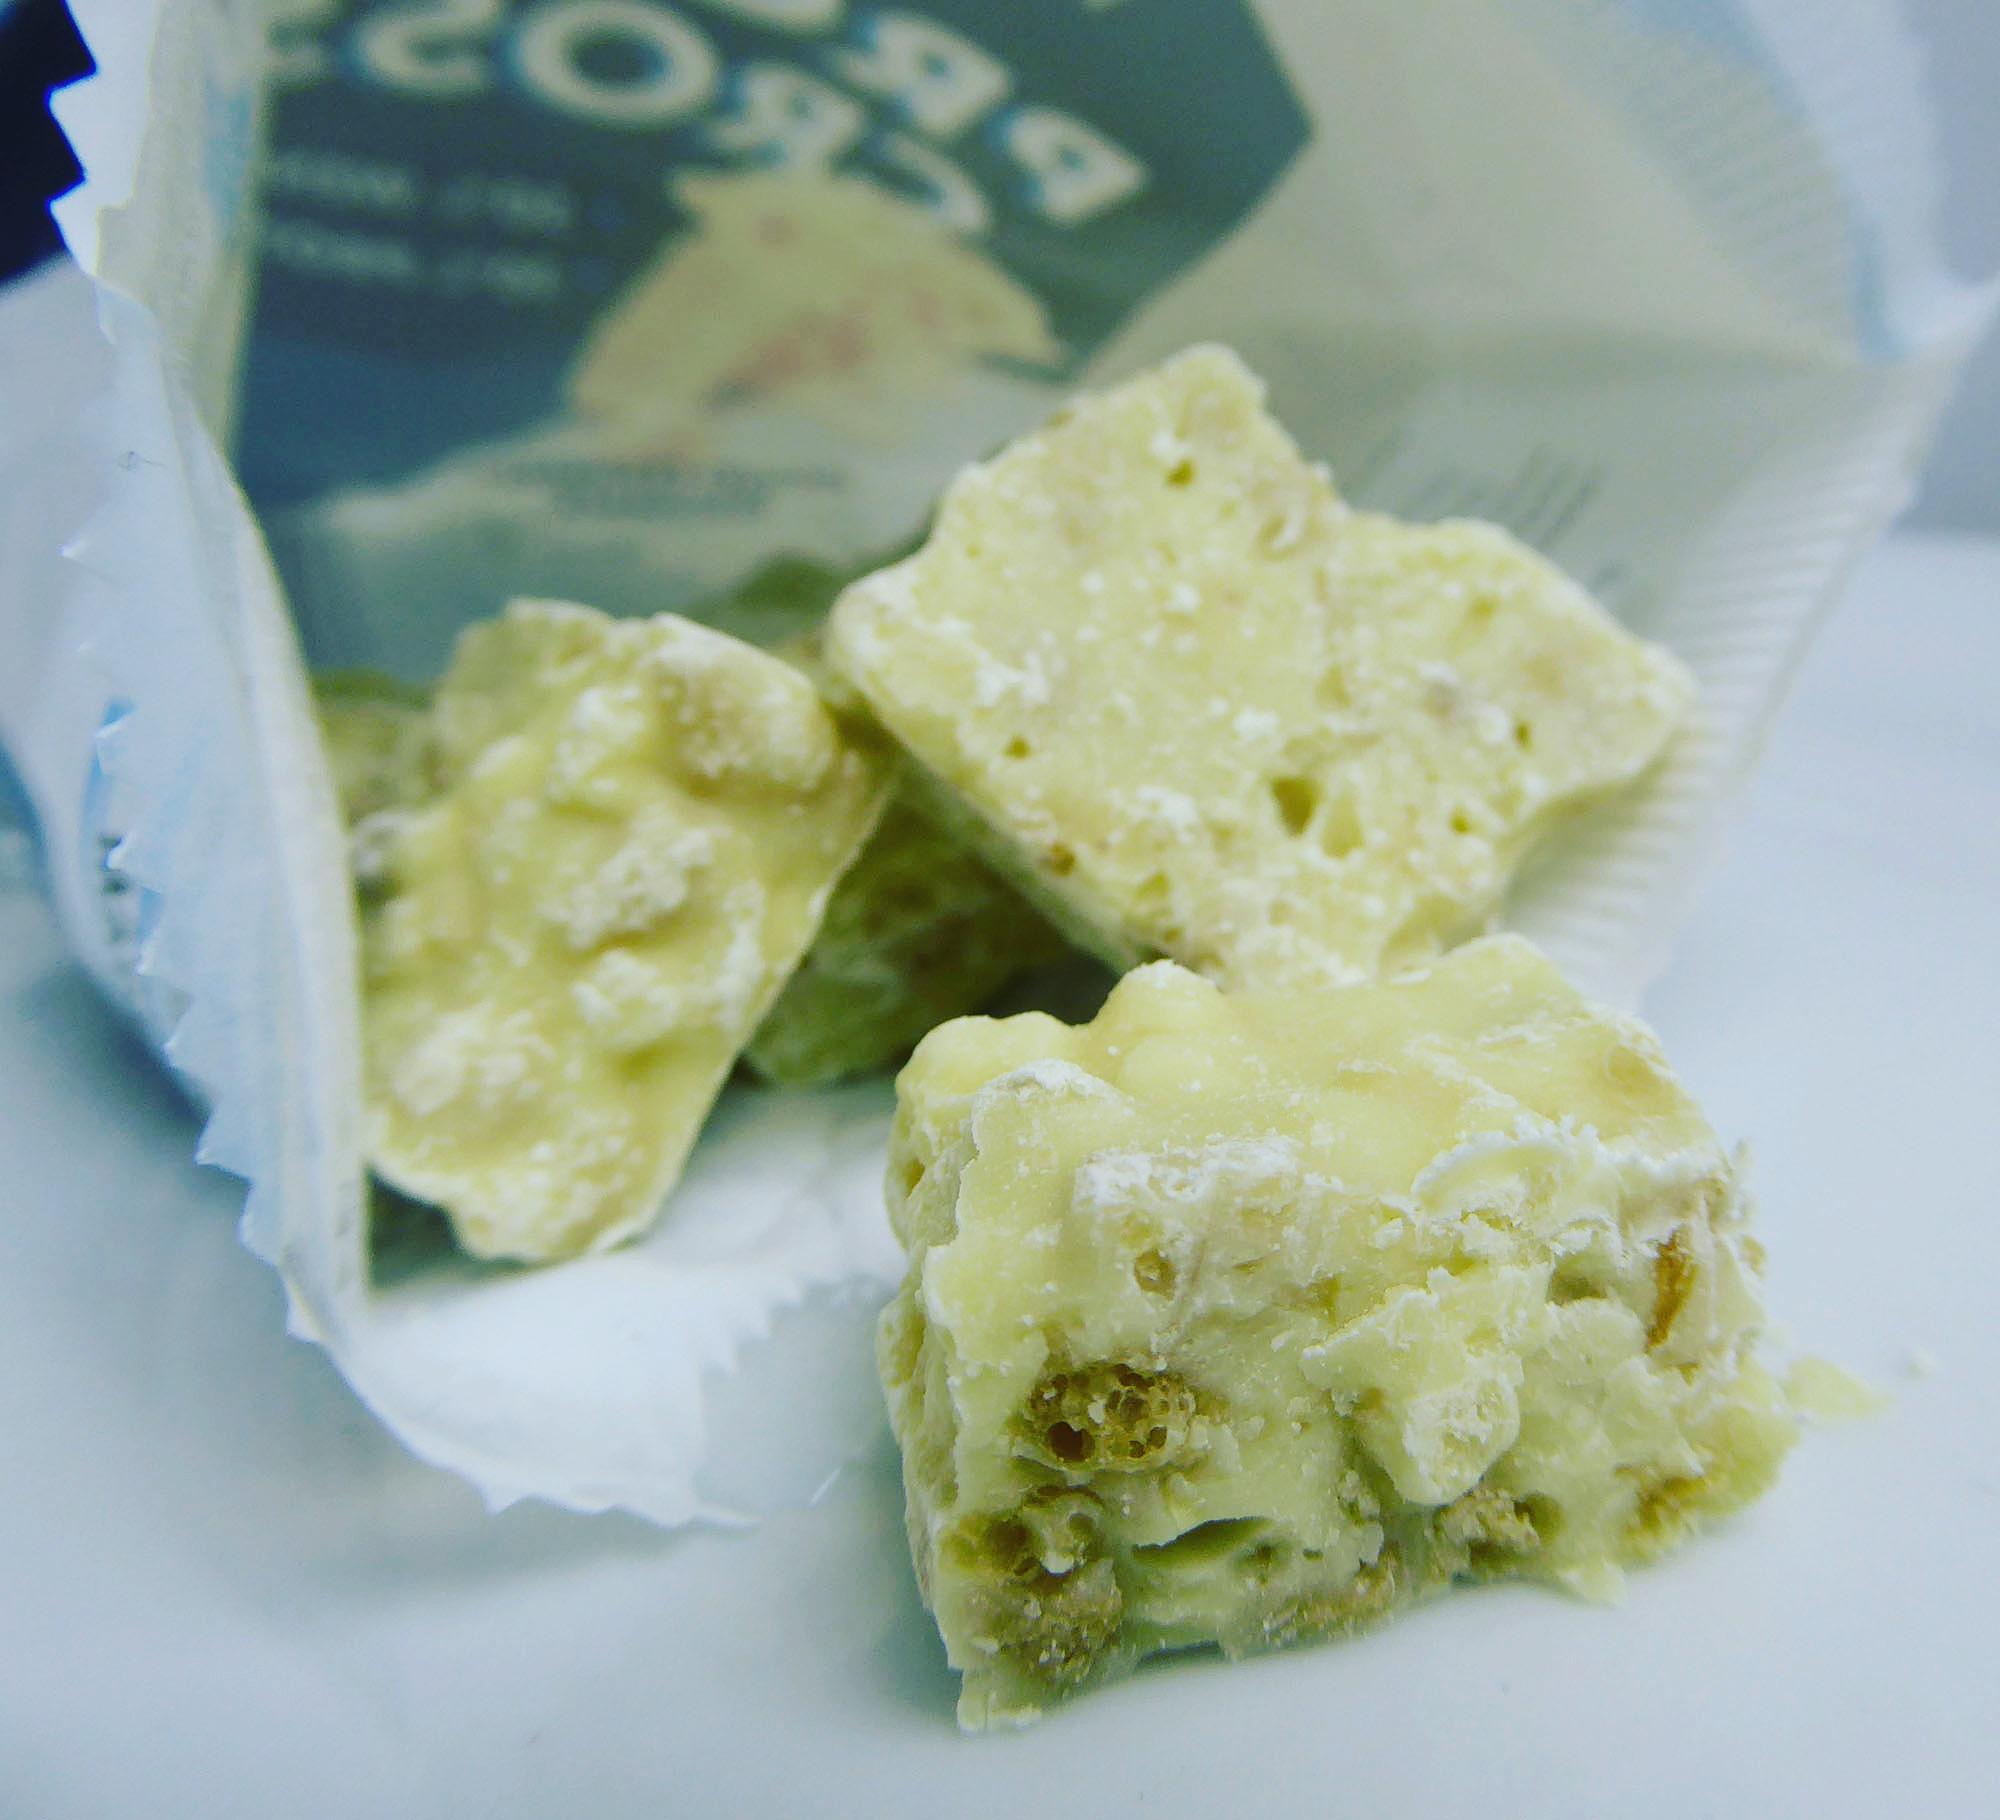 GymPro Whey Protein Isolate Crossies Joghurt Preiselbeer Weisse Schokolade